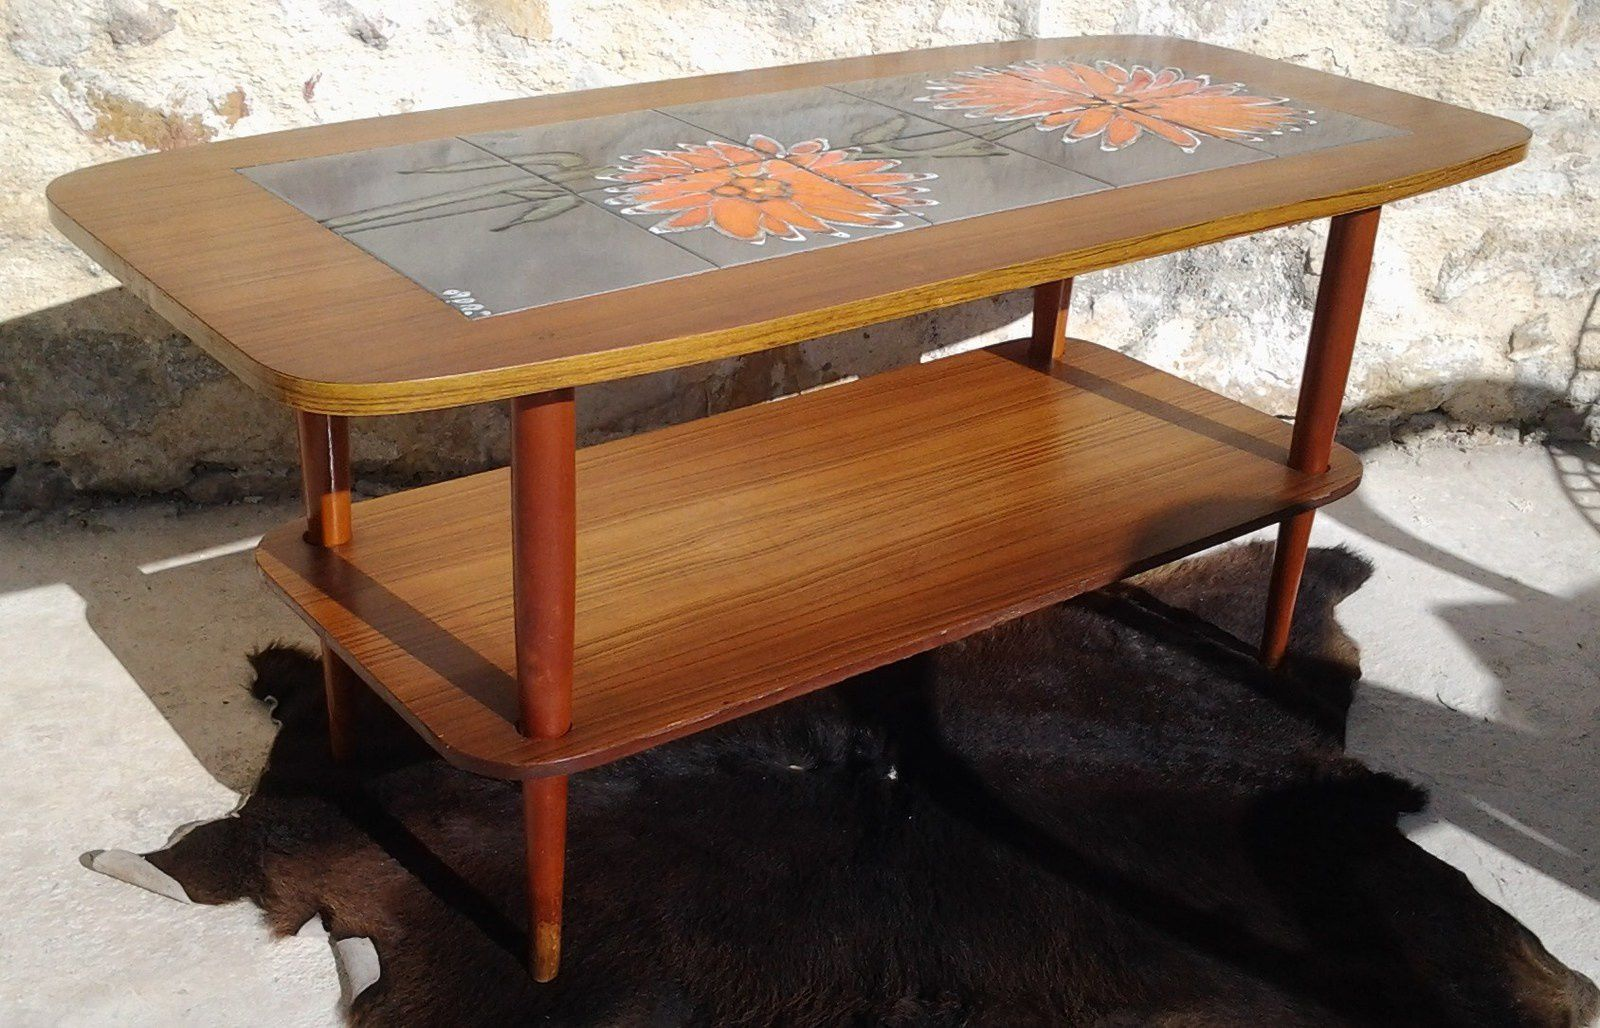 table basse scandinave vintage ann es 60 vente de mobilier vintage design scandinave ann es 50. Black Bedroom Furniture Sets. Home Design Ideas